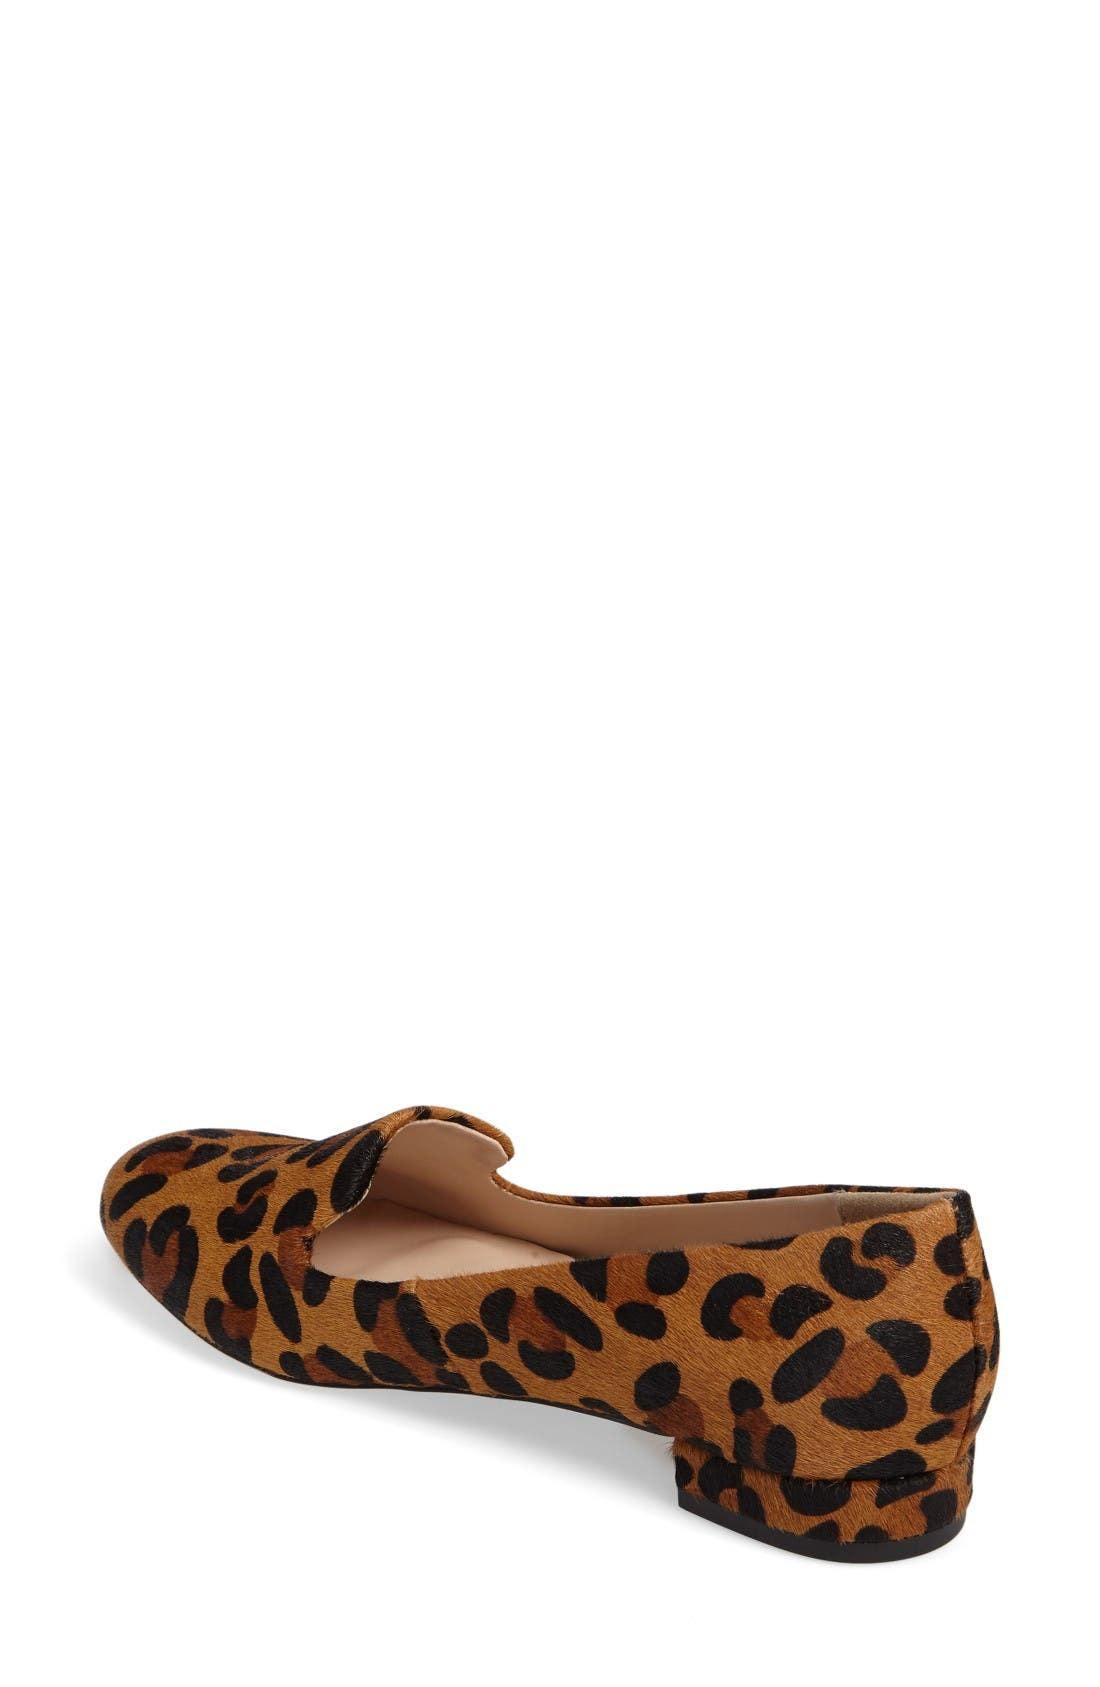 Nitsa Genuine Calf Hair Loafer,                             Alternate thumbnail 2, color,                             Leopard